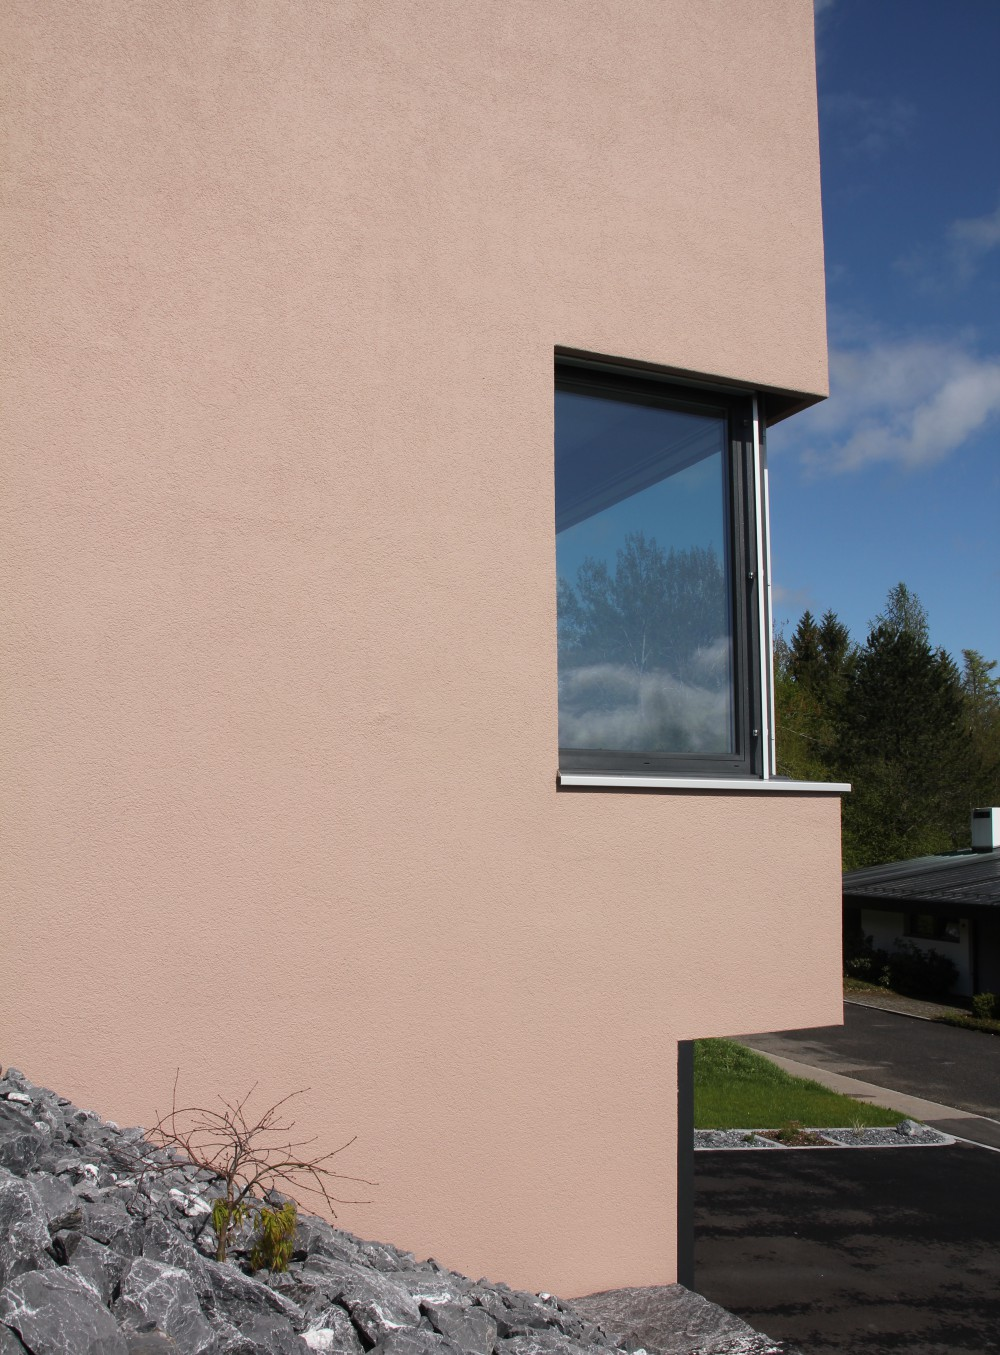 Maison-a-tramelan-132-1002-9